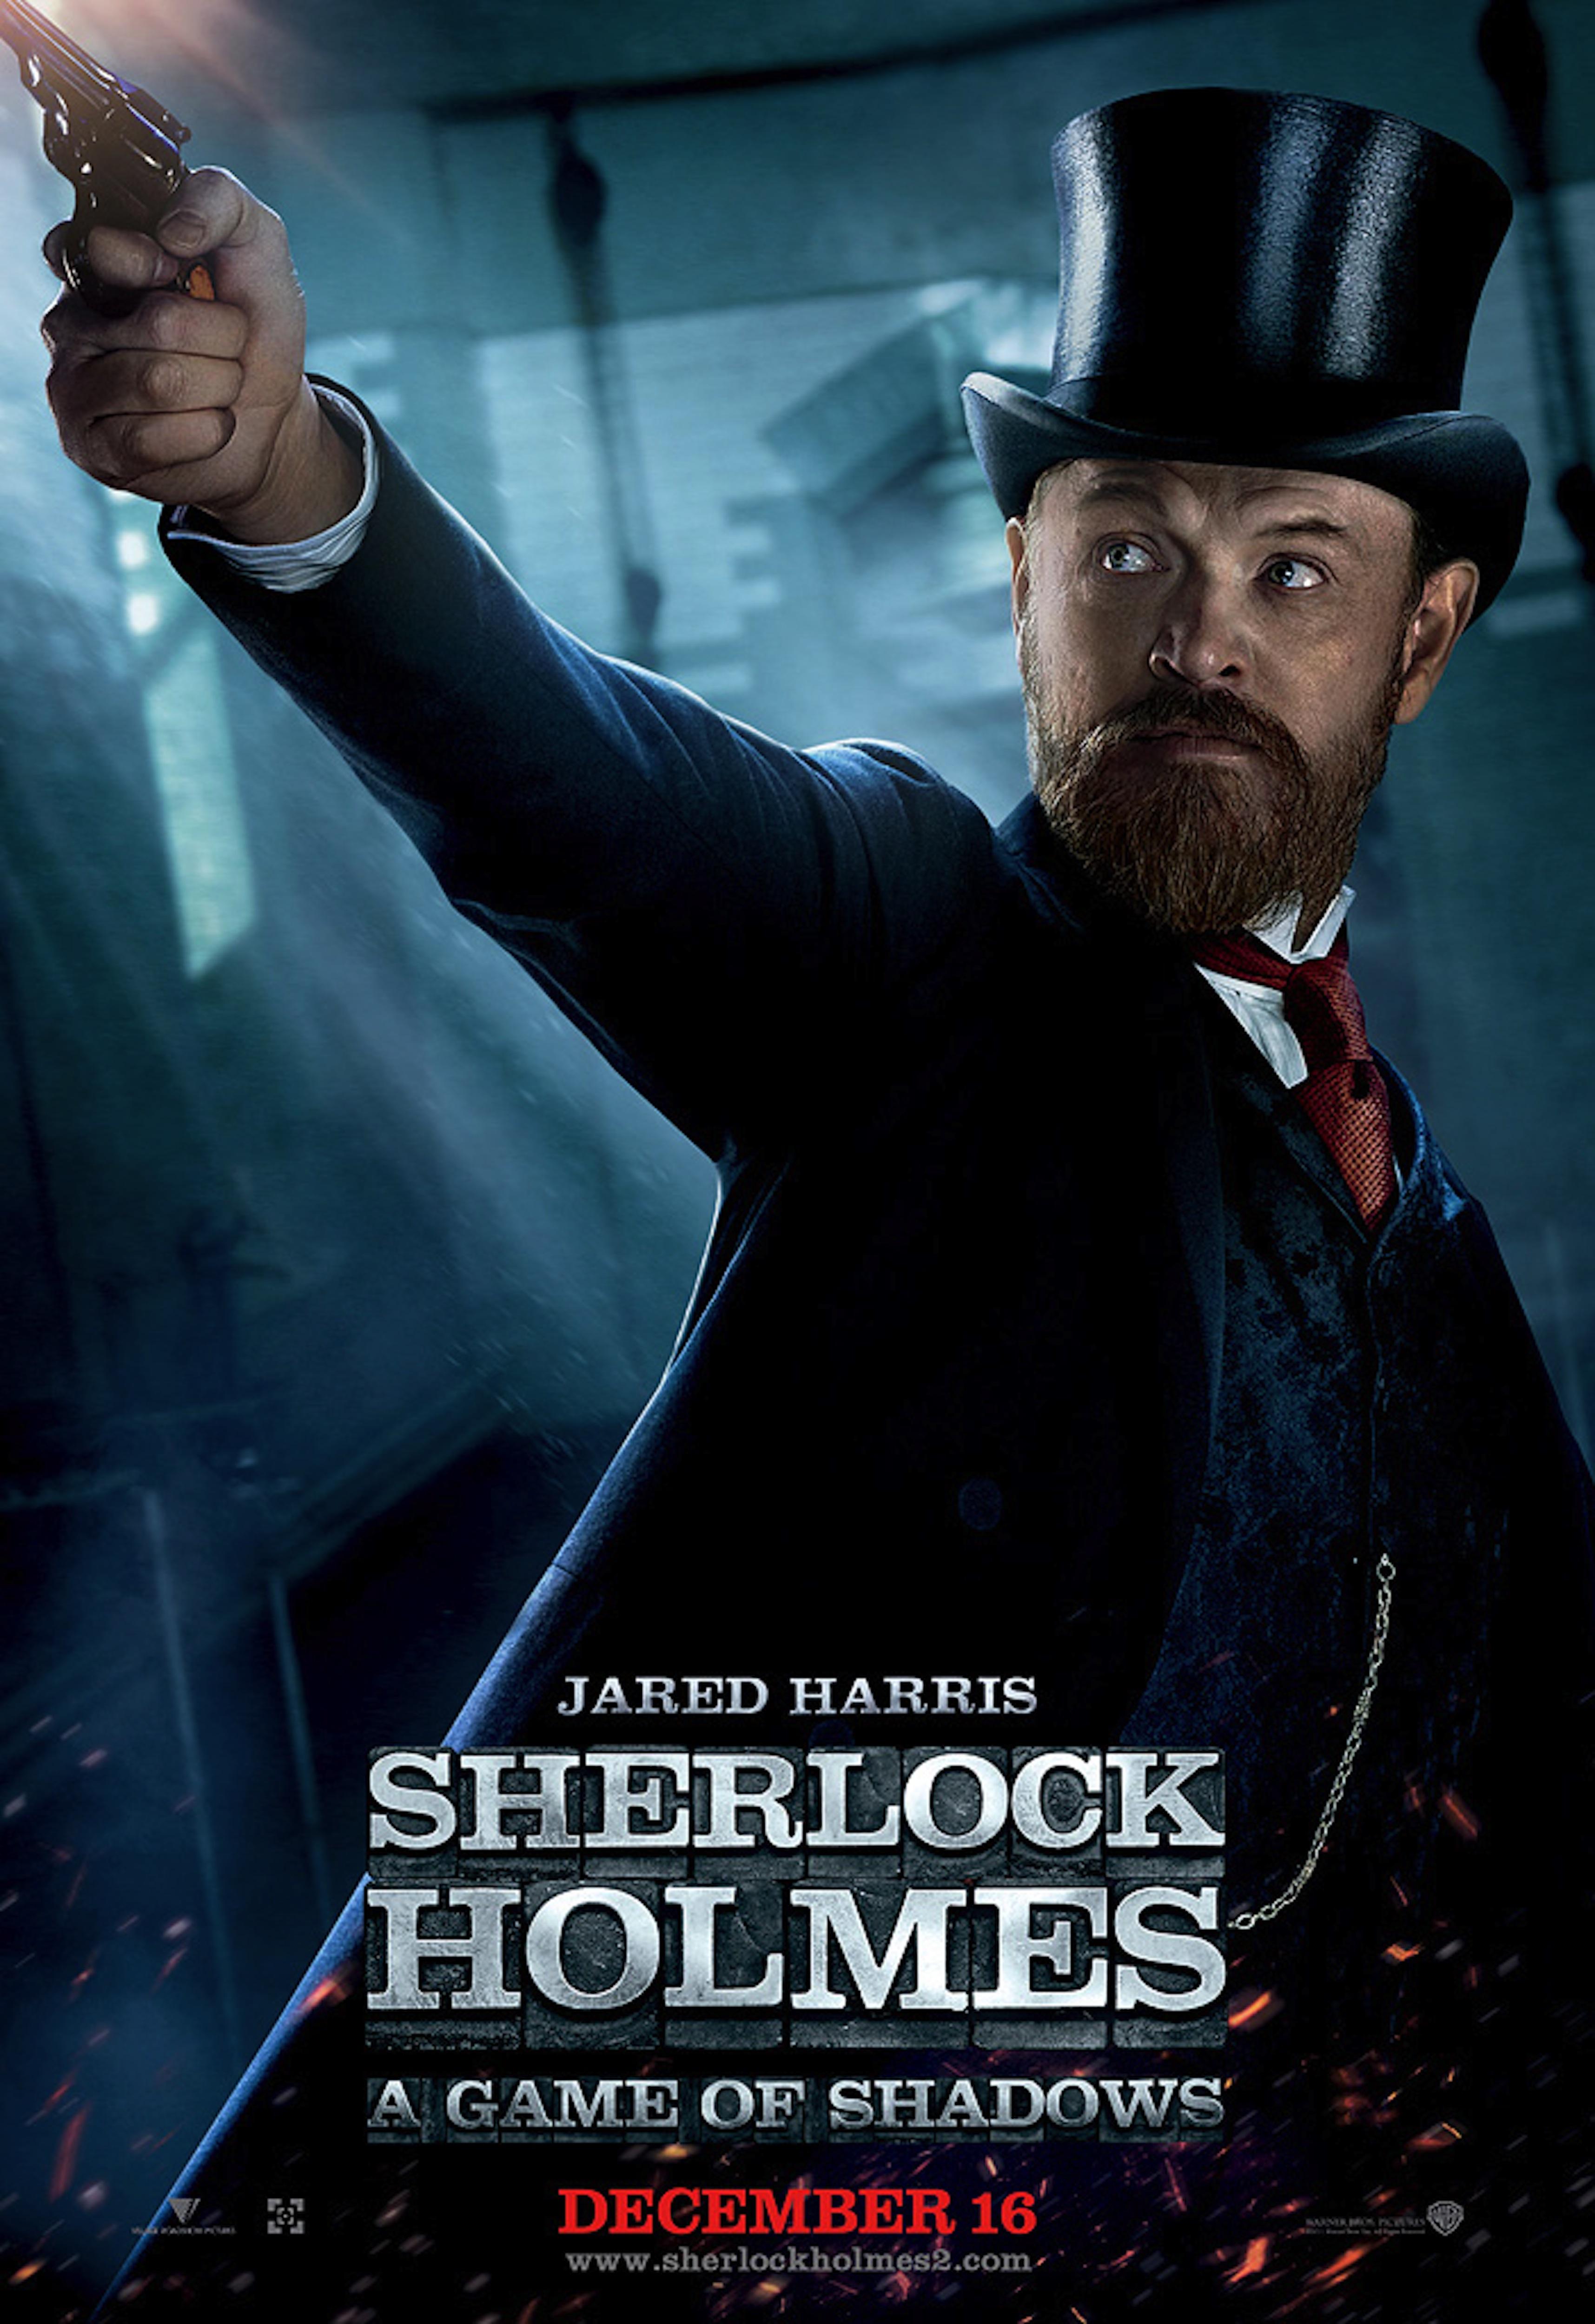 Sherlock Holmes Movie Sherlock Holmes A Game Of Shadows Movie Poster